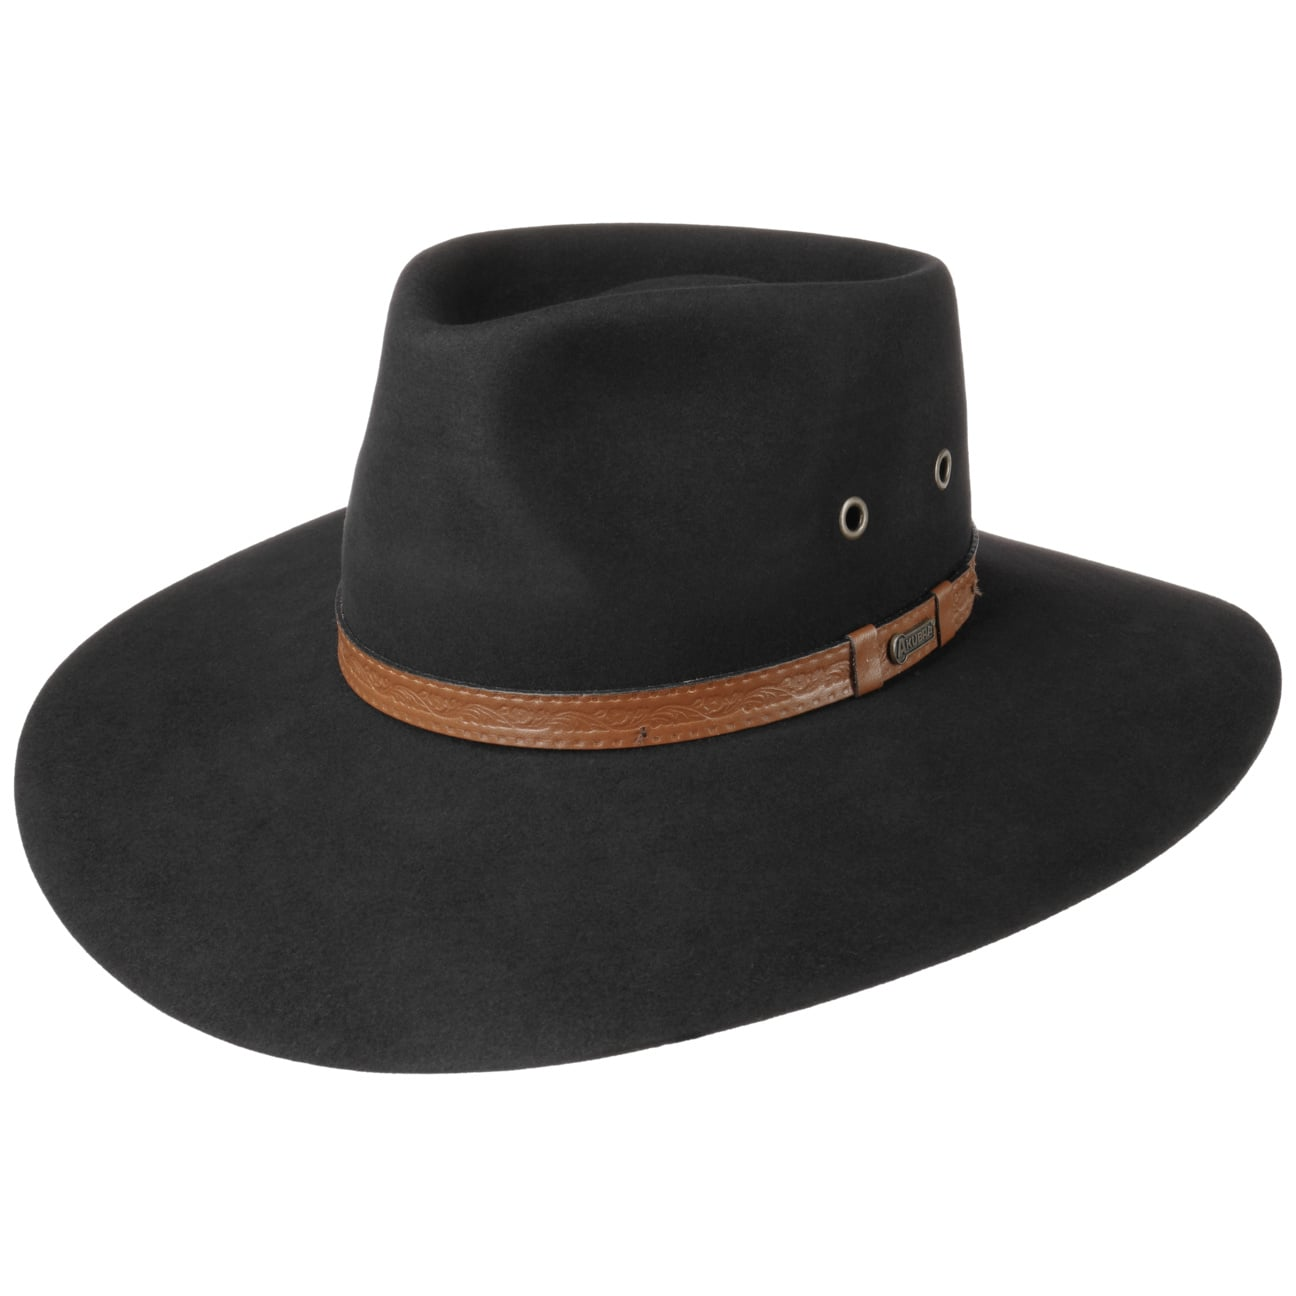 Sombrero The Territory by Akubra  sombrero outdoor